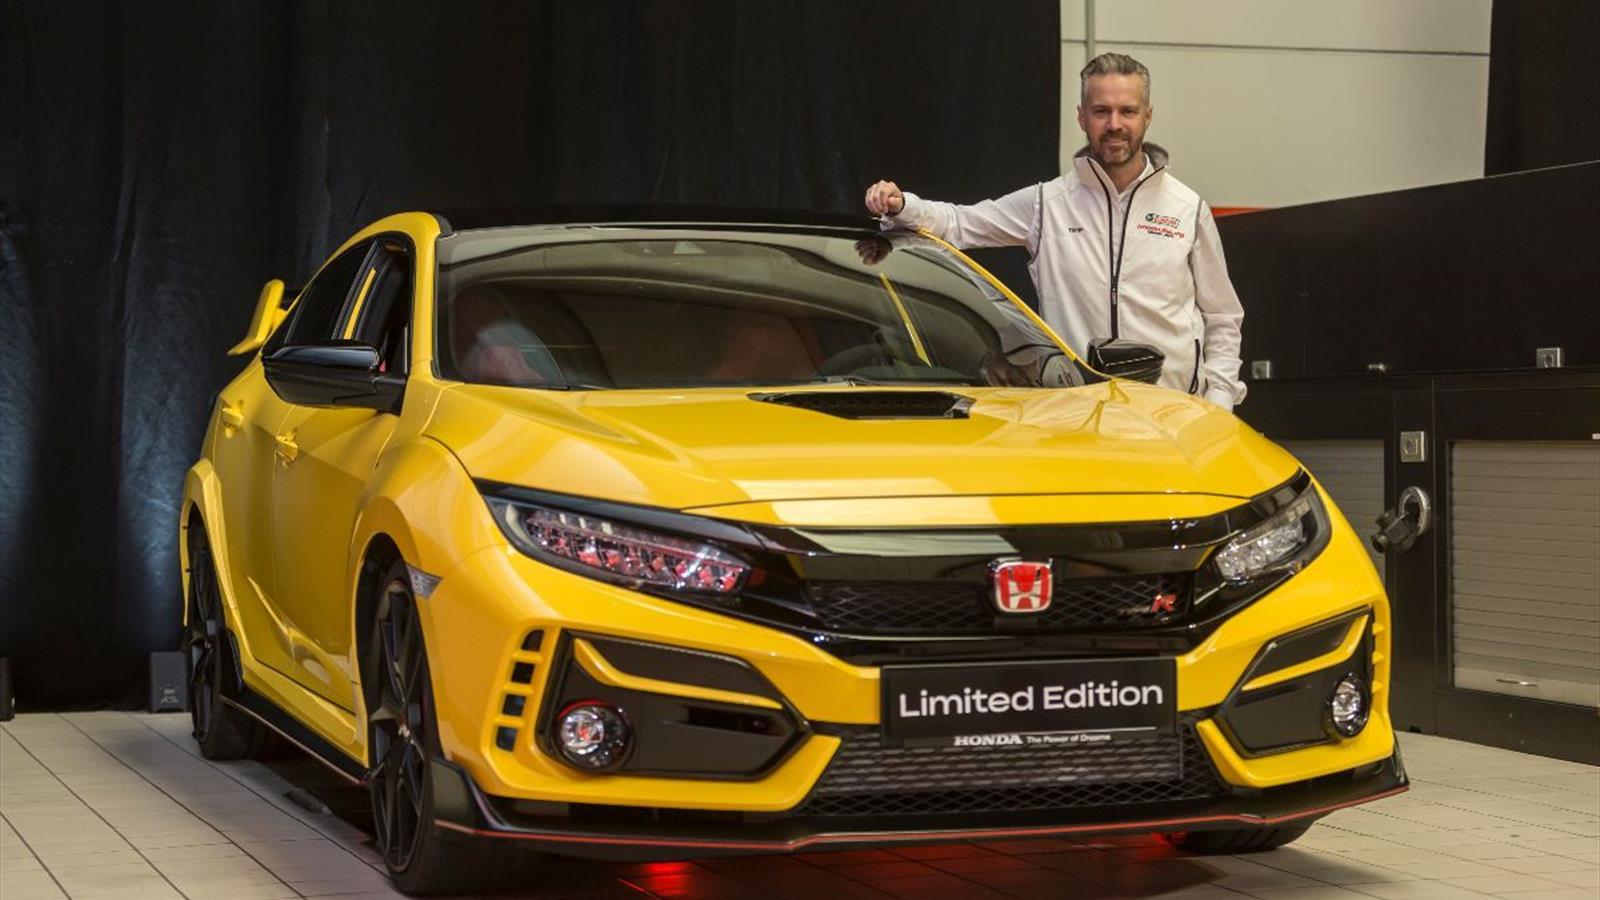 Honda-powered WTCR racer Monteiro helps launch new road-going Civic Type R variants - Eurosport.com